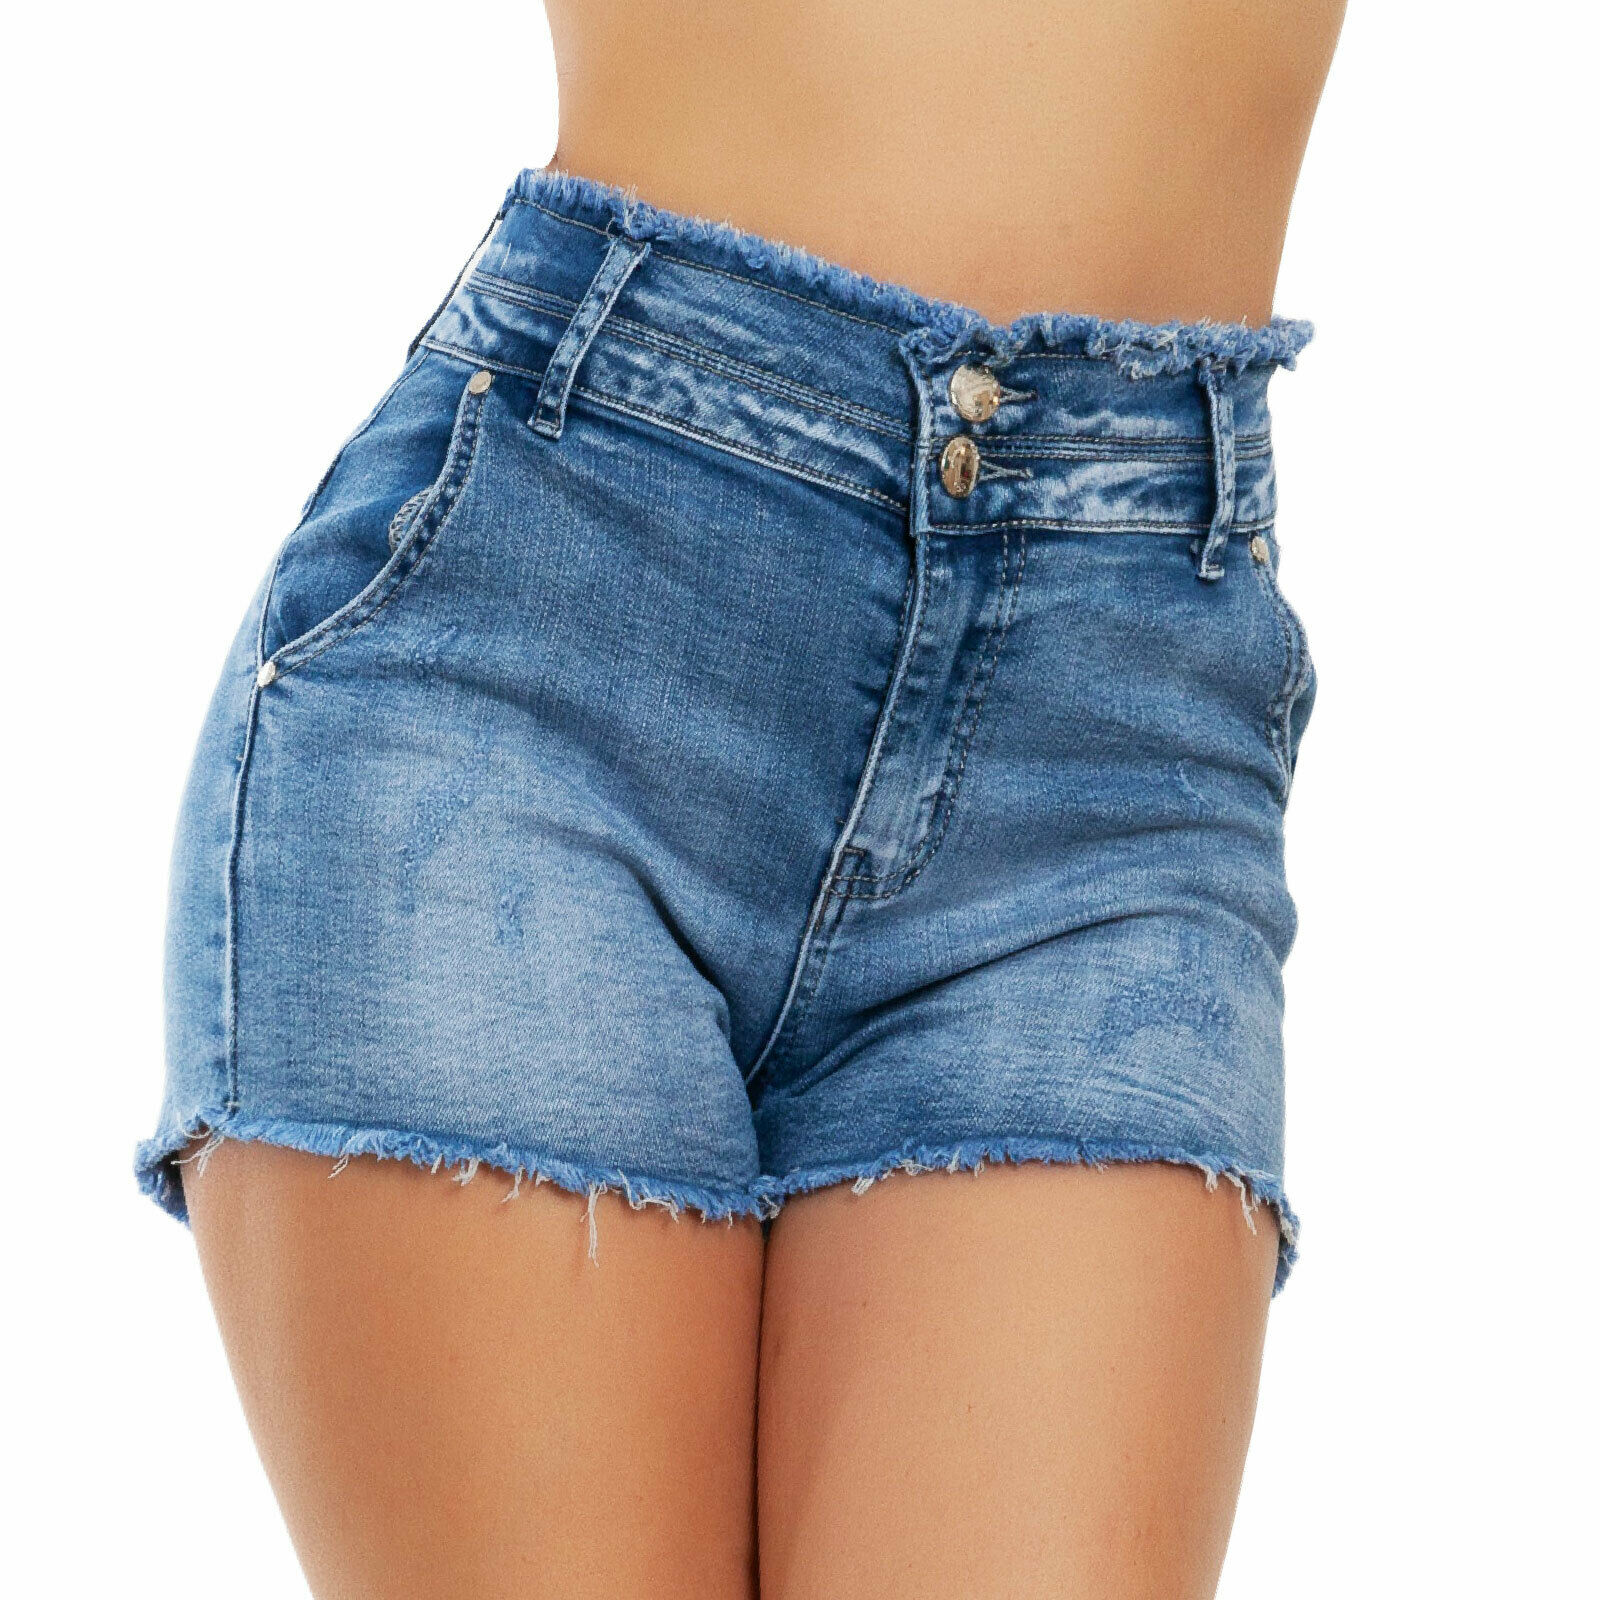 comprare on line 70297 3a1ab Dettagli su Pantaloncini donna jeans shorts hot pants vita alta sfrangiati  TOOCOOL VI-1837